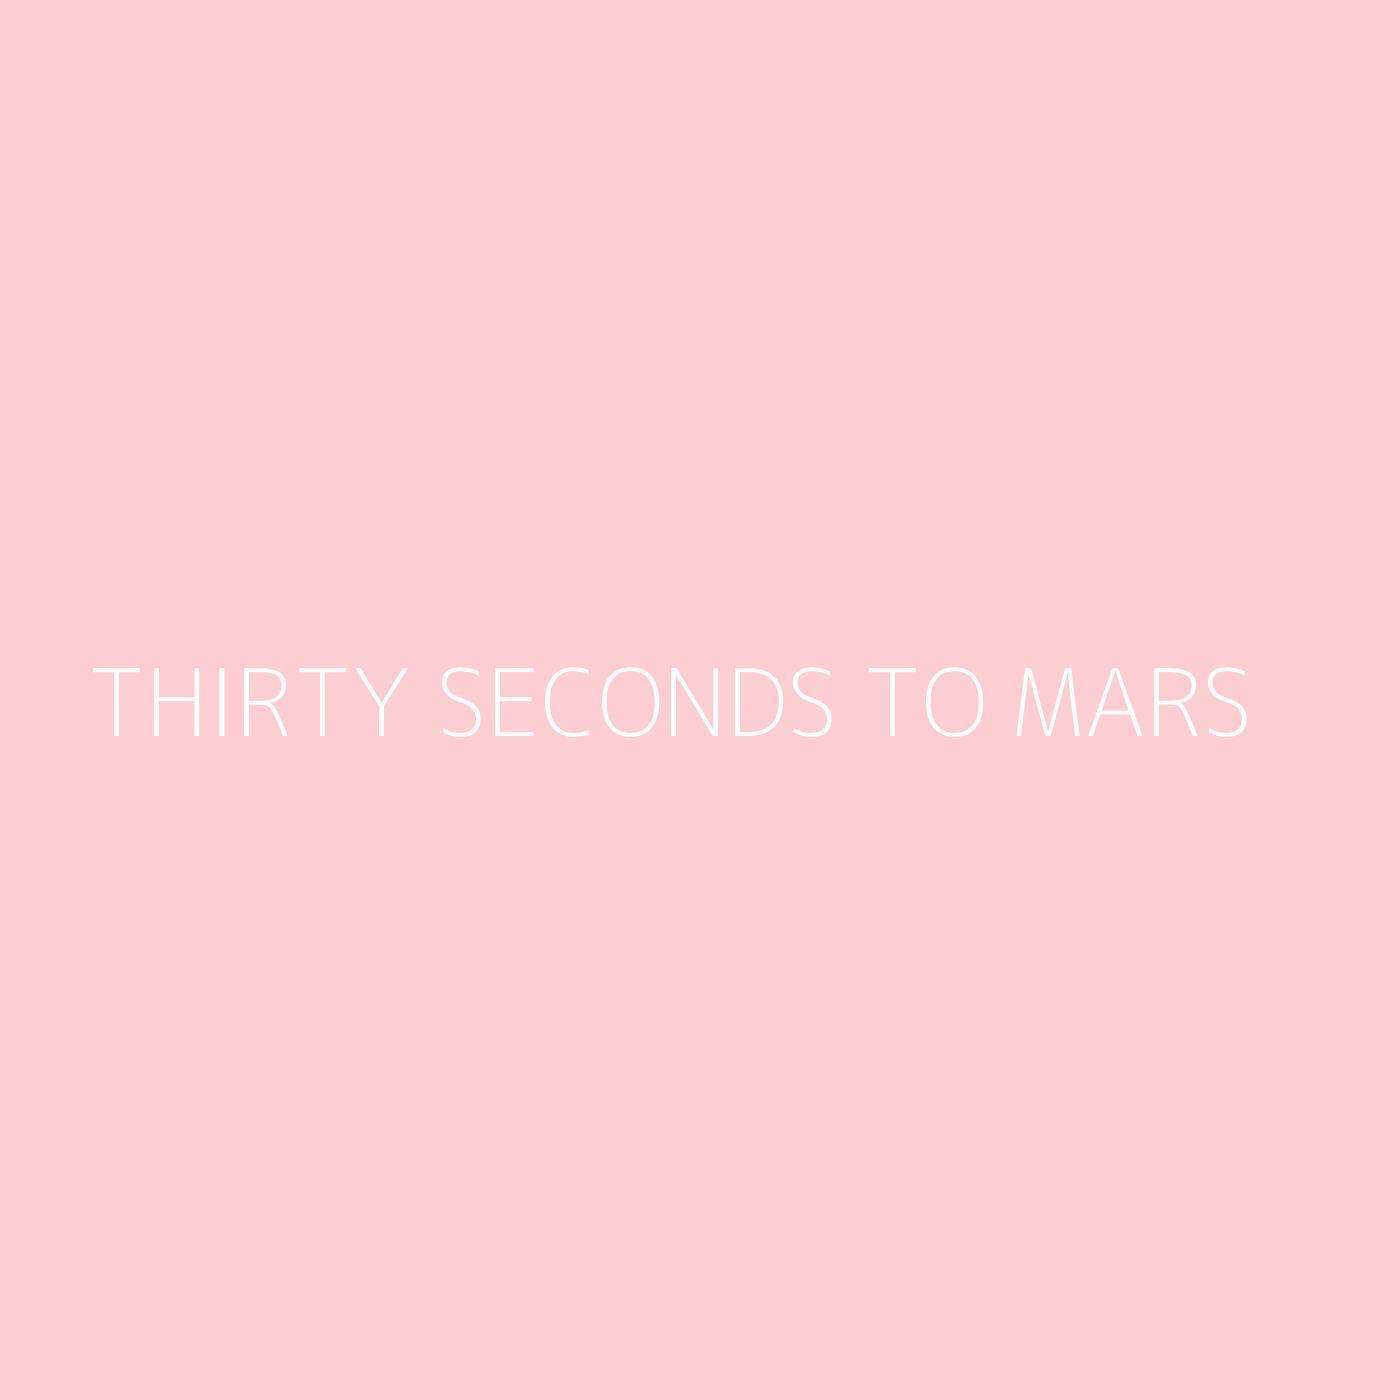 Thirty Seconds To Mars Playlist Artwork